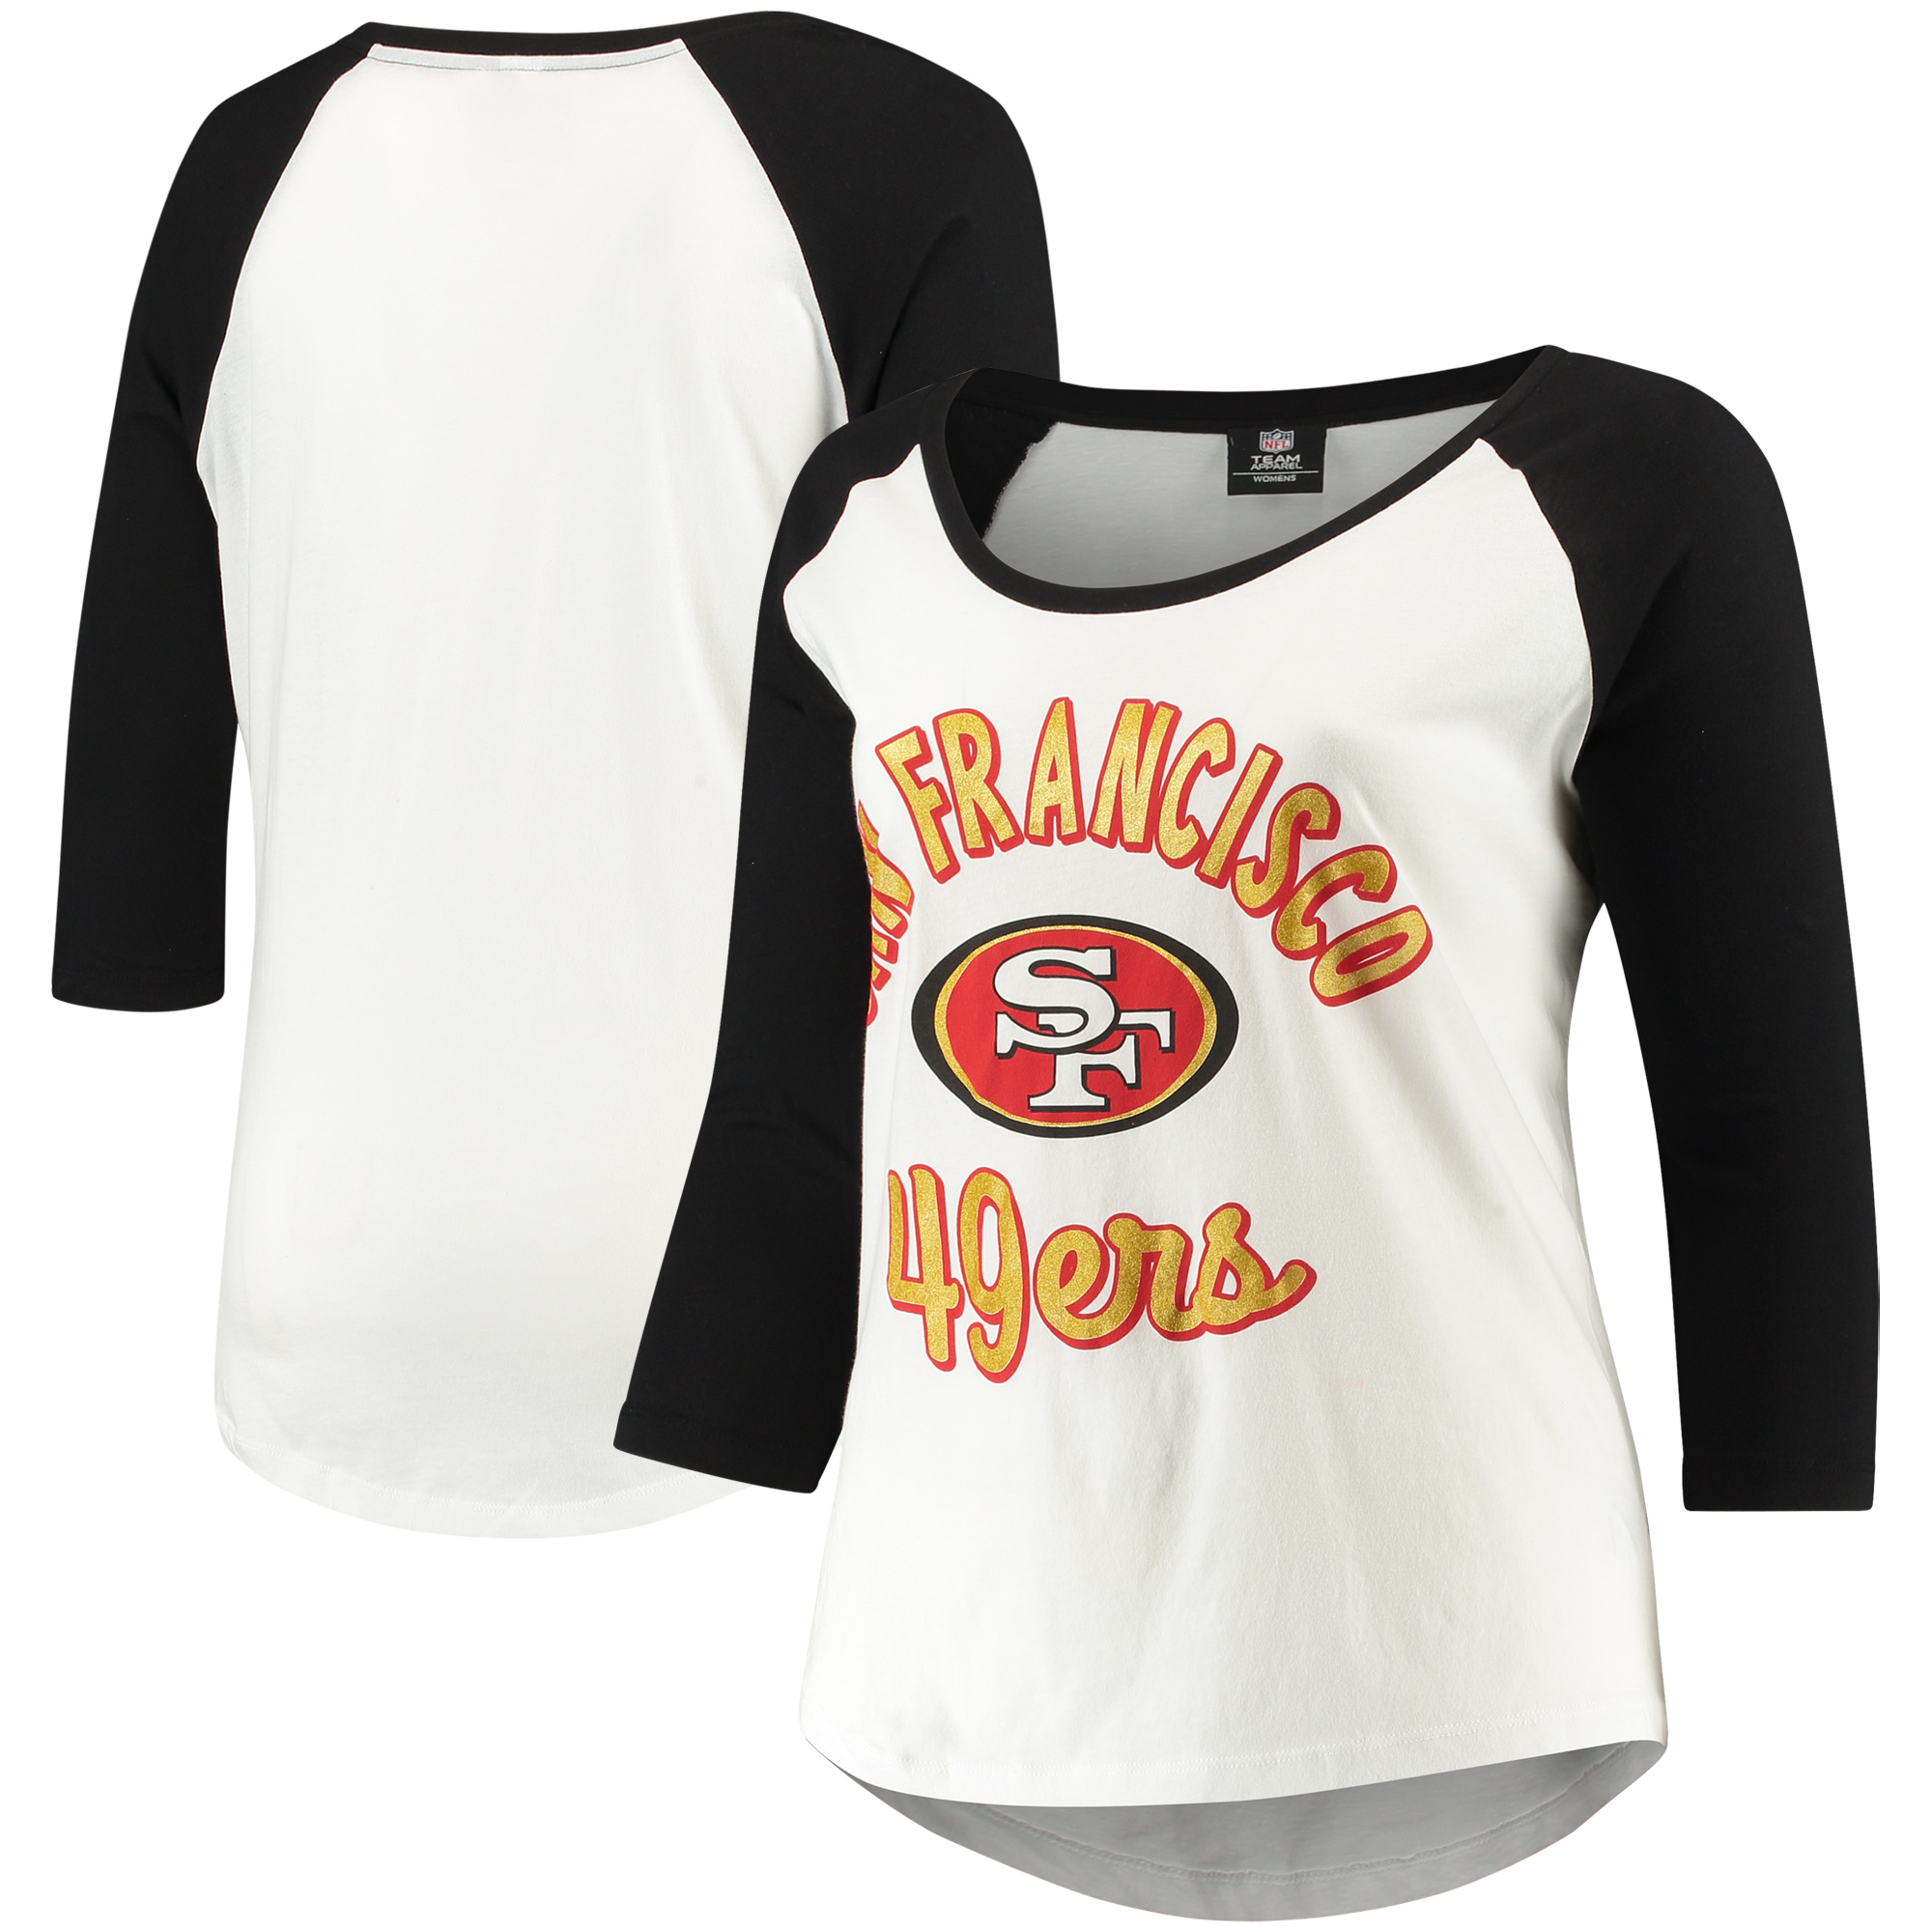 San Francisco 49ers 5th & Ocean by New Era Women's Plus Size 3/4-Sleeve Raglan T-Shirt - White/Black